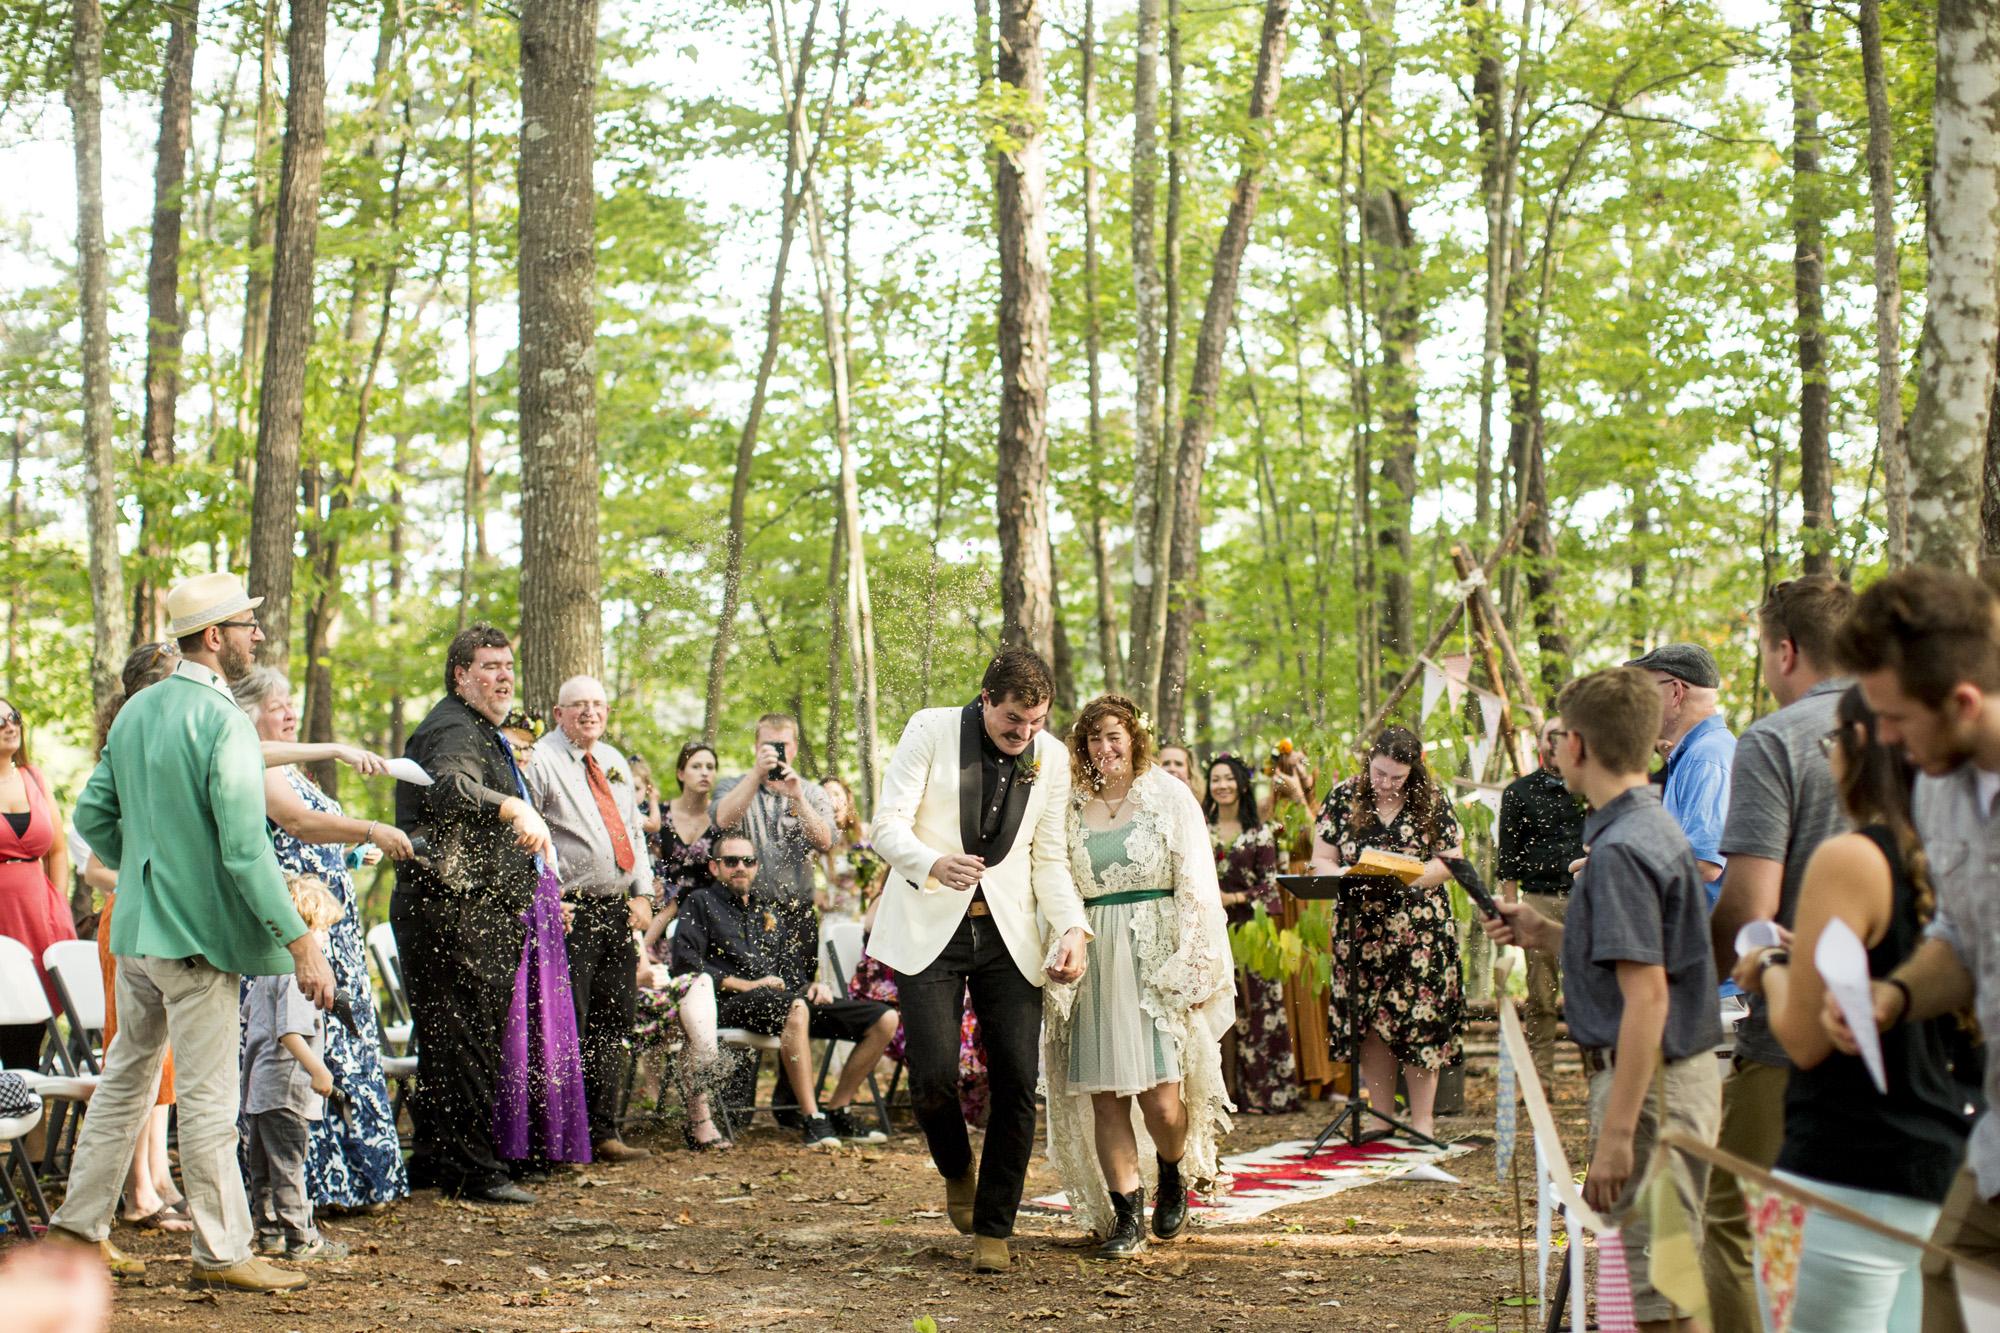 Seriously_Sabrina_Photography_Red_River_Gorge_Kentucky_Wedding_ShawnDana134.jpg